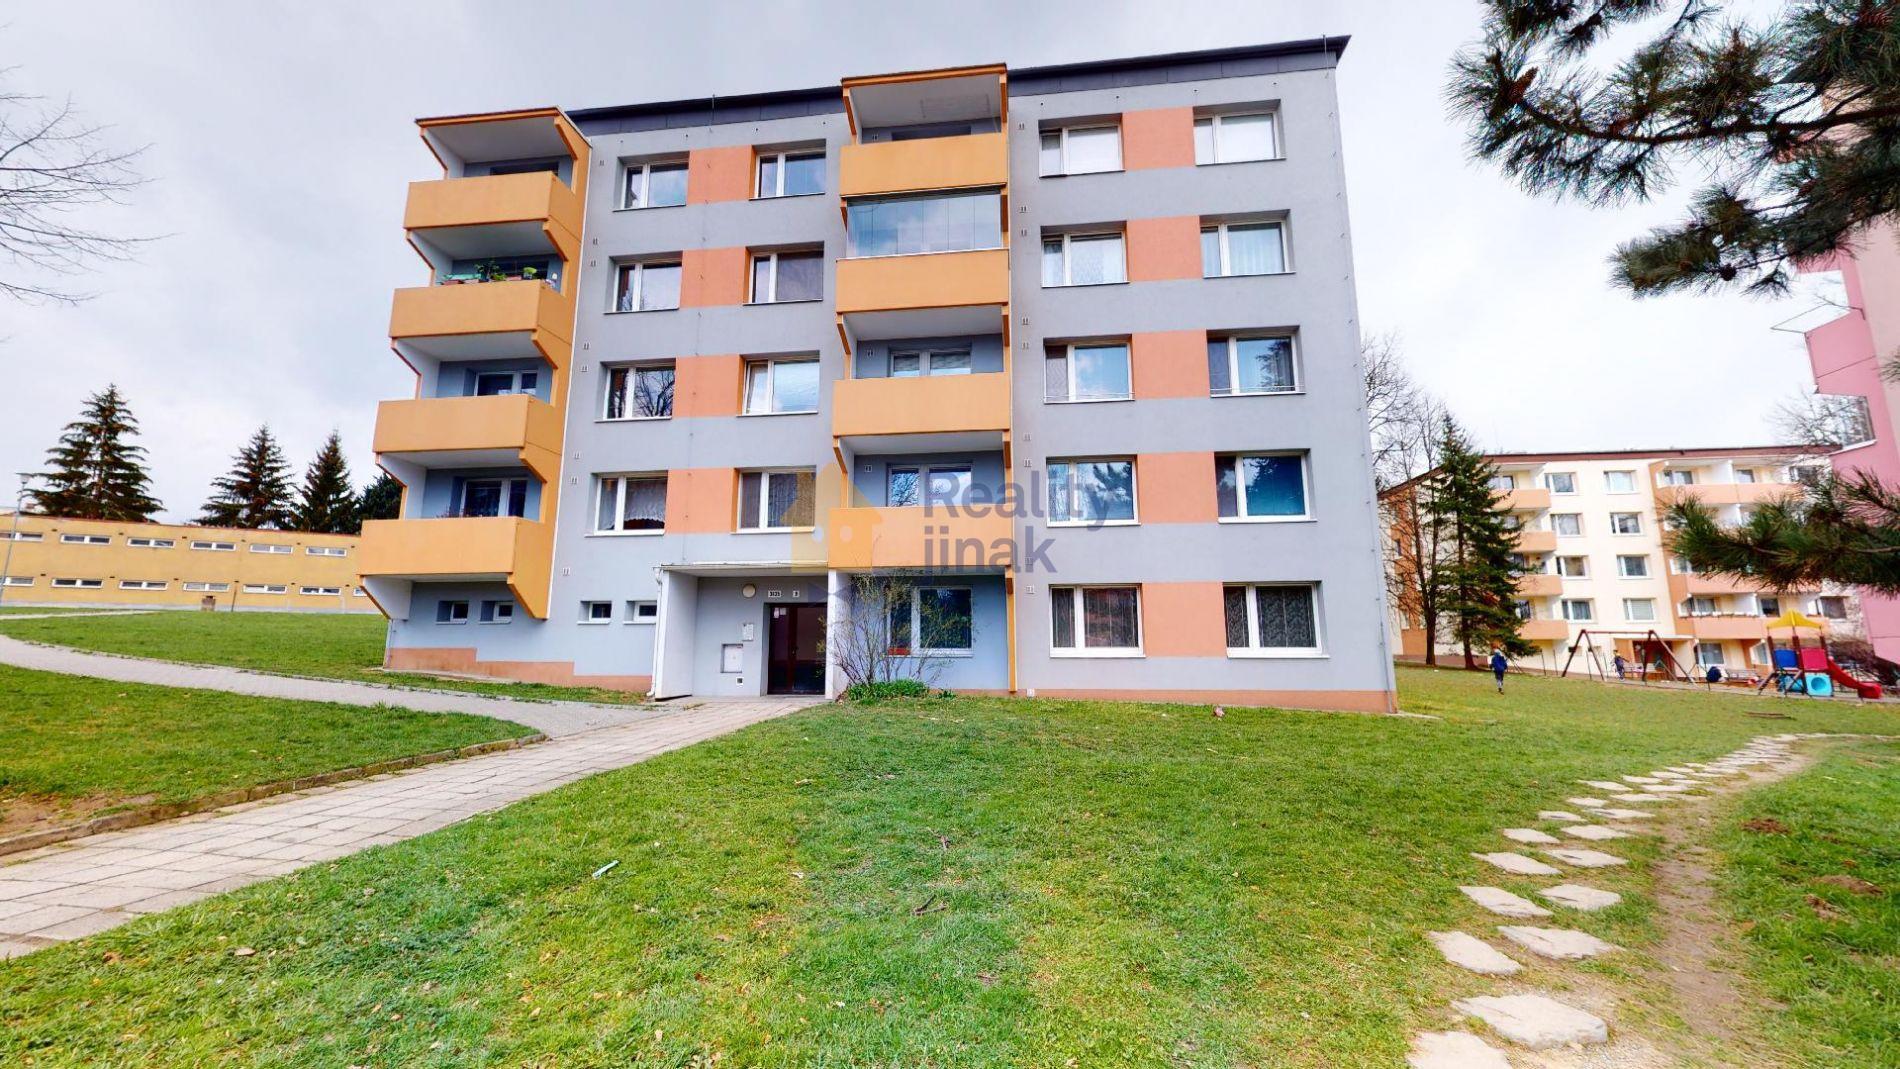 Prodej bytu 3+1, 75 m2, komora, Jihlava